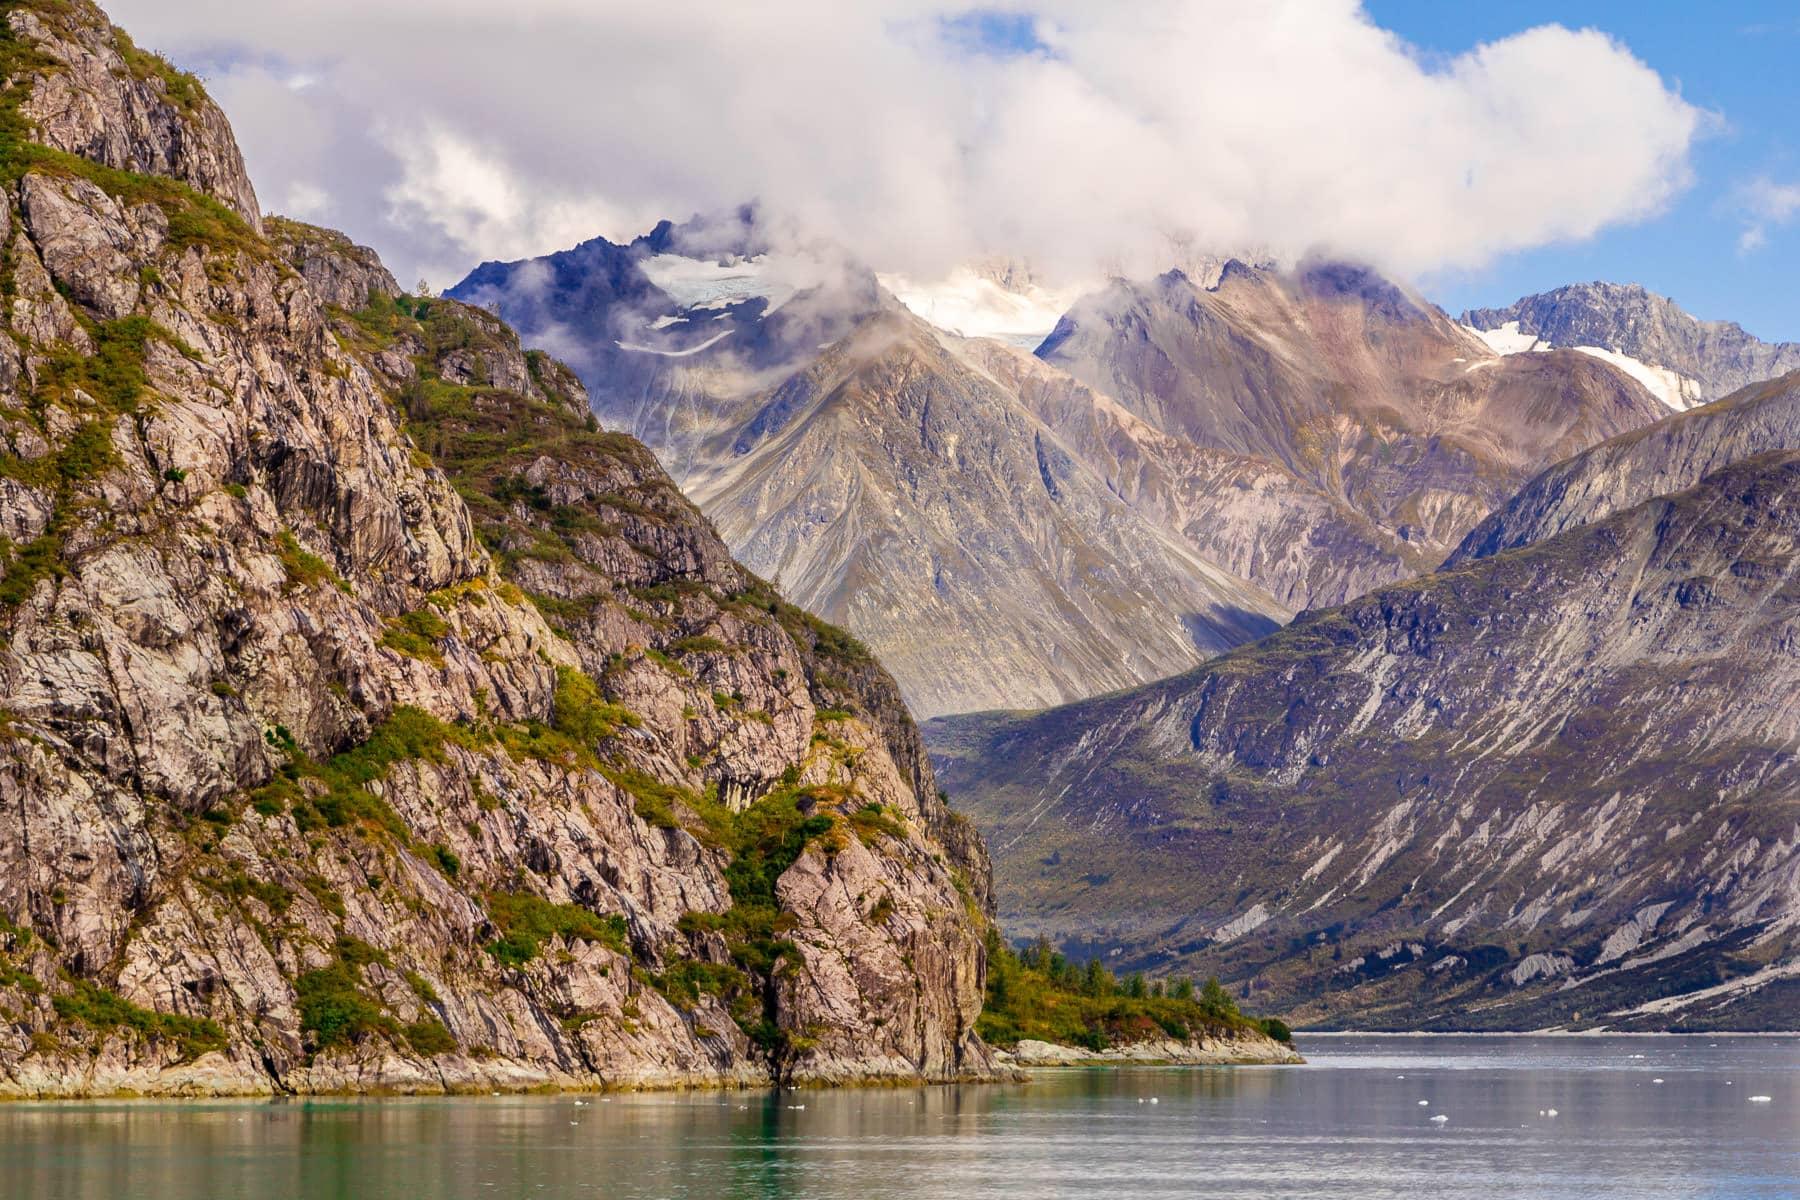 Evergreen trees grow on a rocky mountainside in Alaska's Glacier Bay National Park.